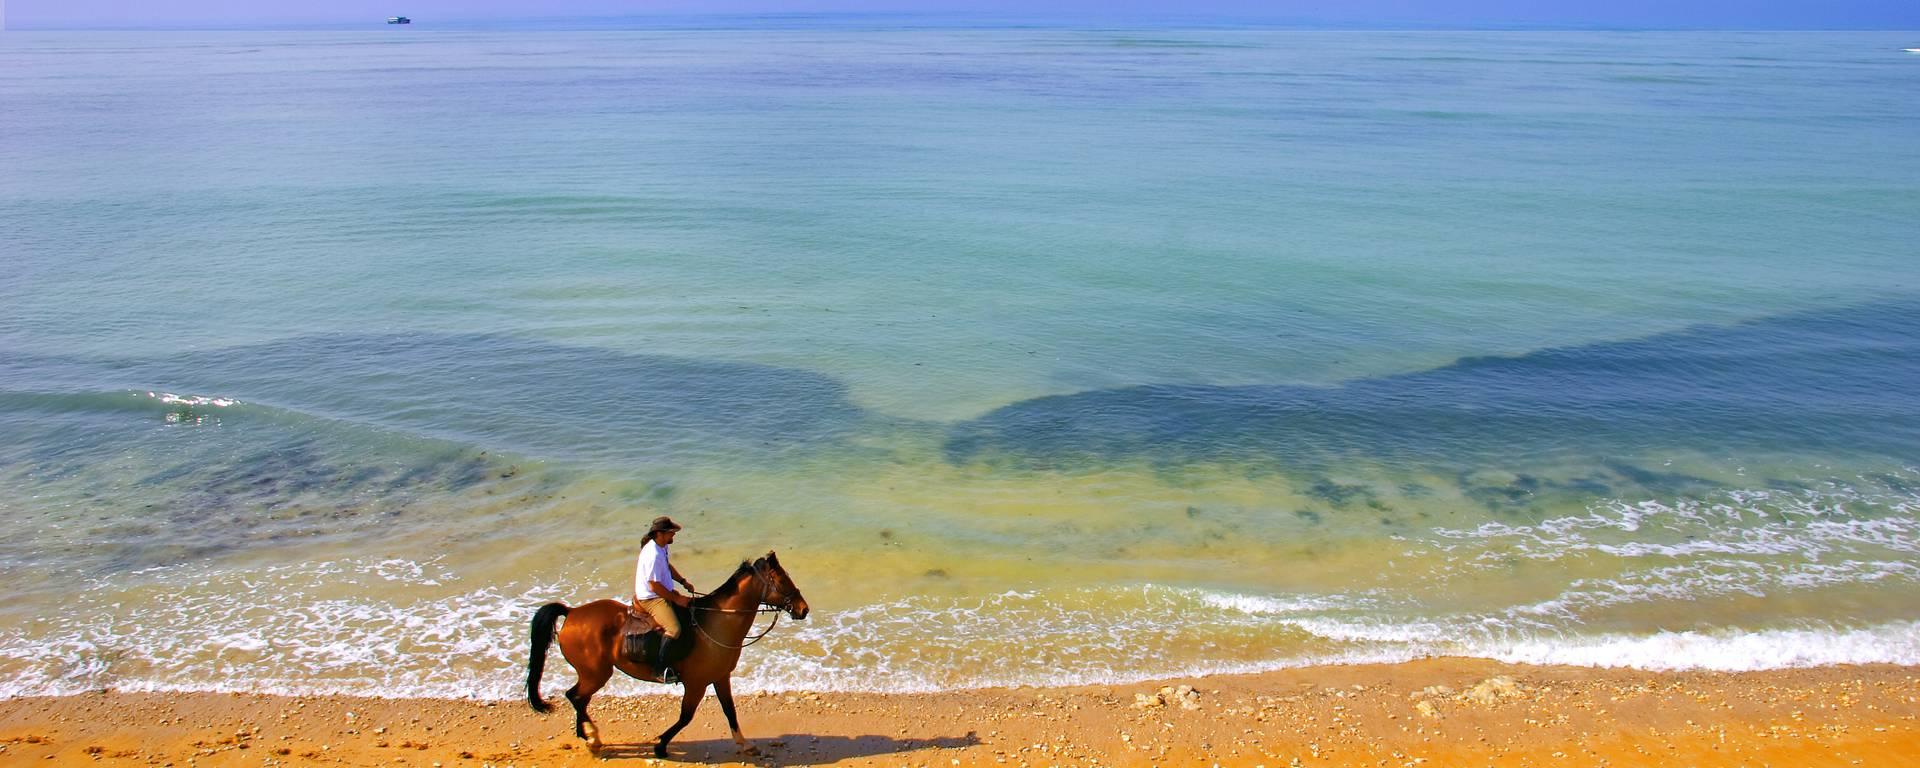 Horseback ride on the beach by François Blanchard